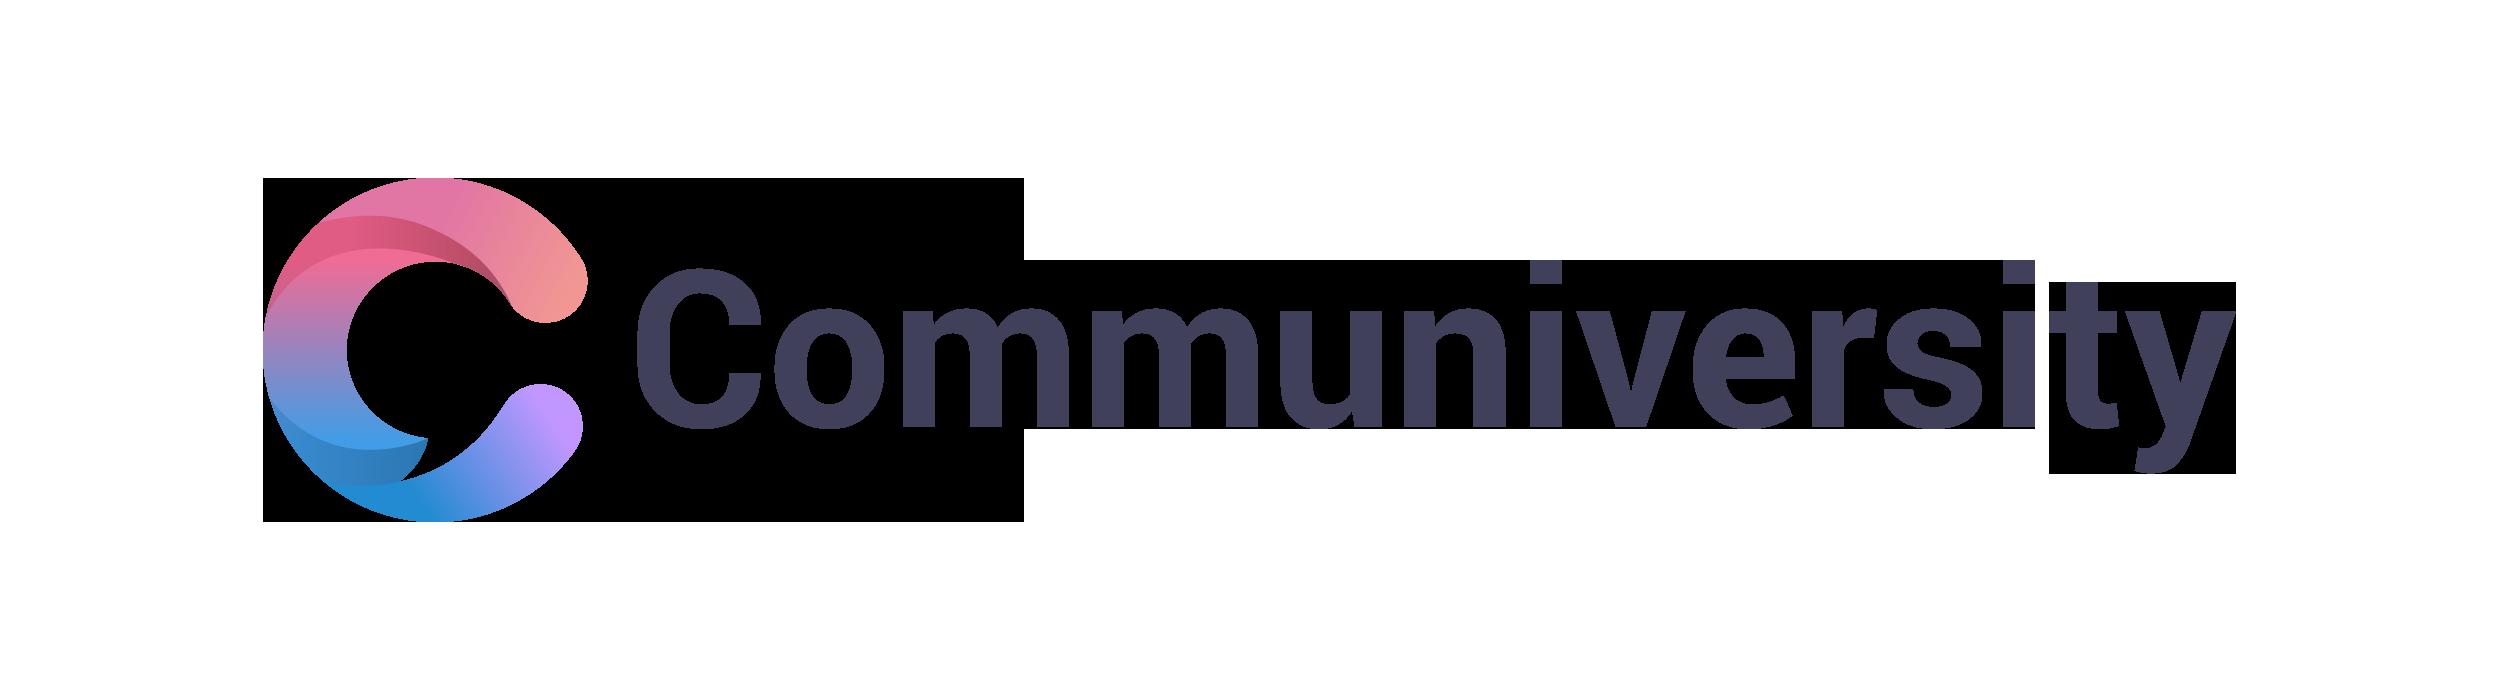 Communiversity Logo